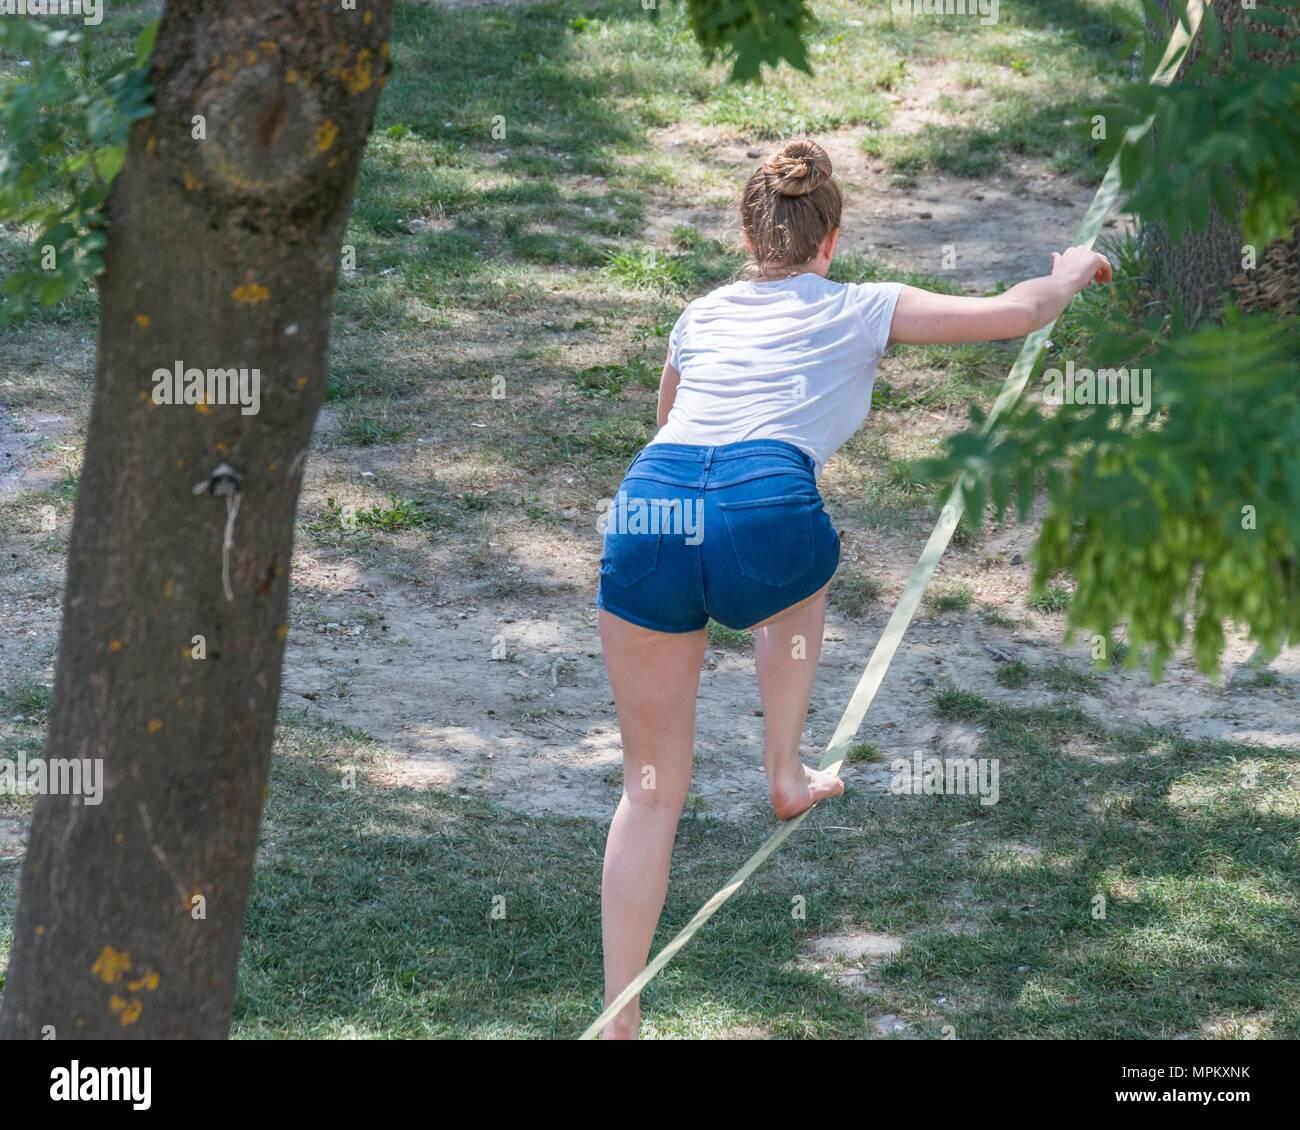 A woman balancing on a slag line, Germany - Stock Image